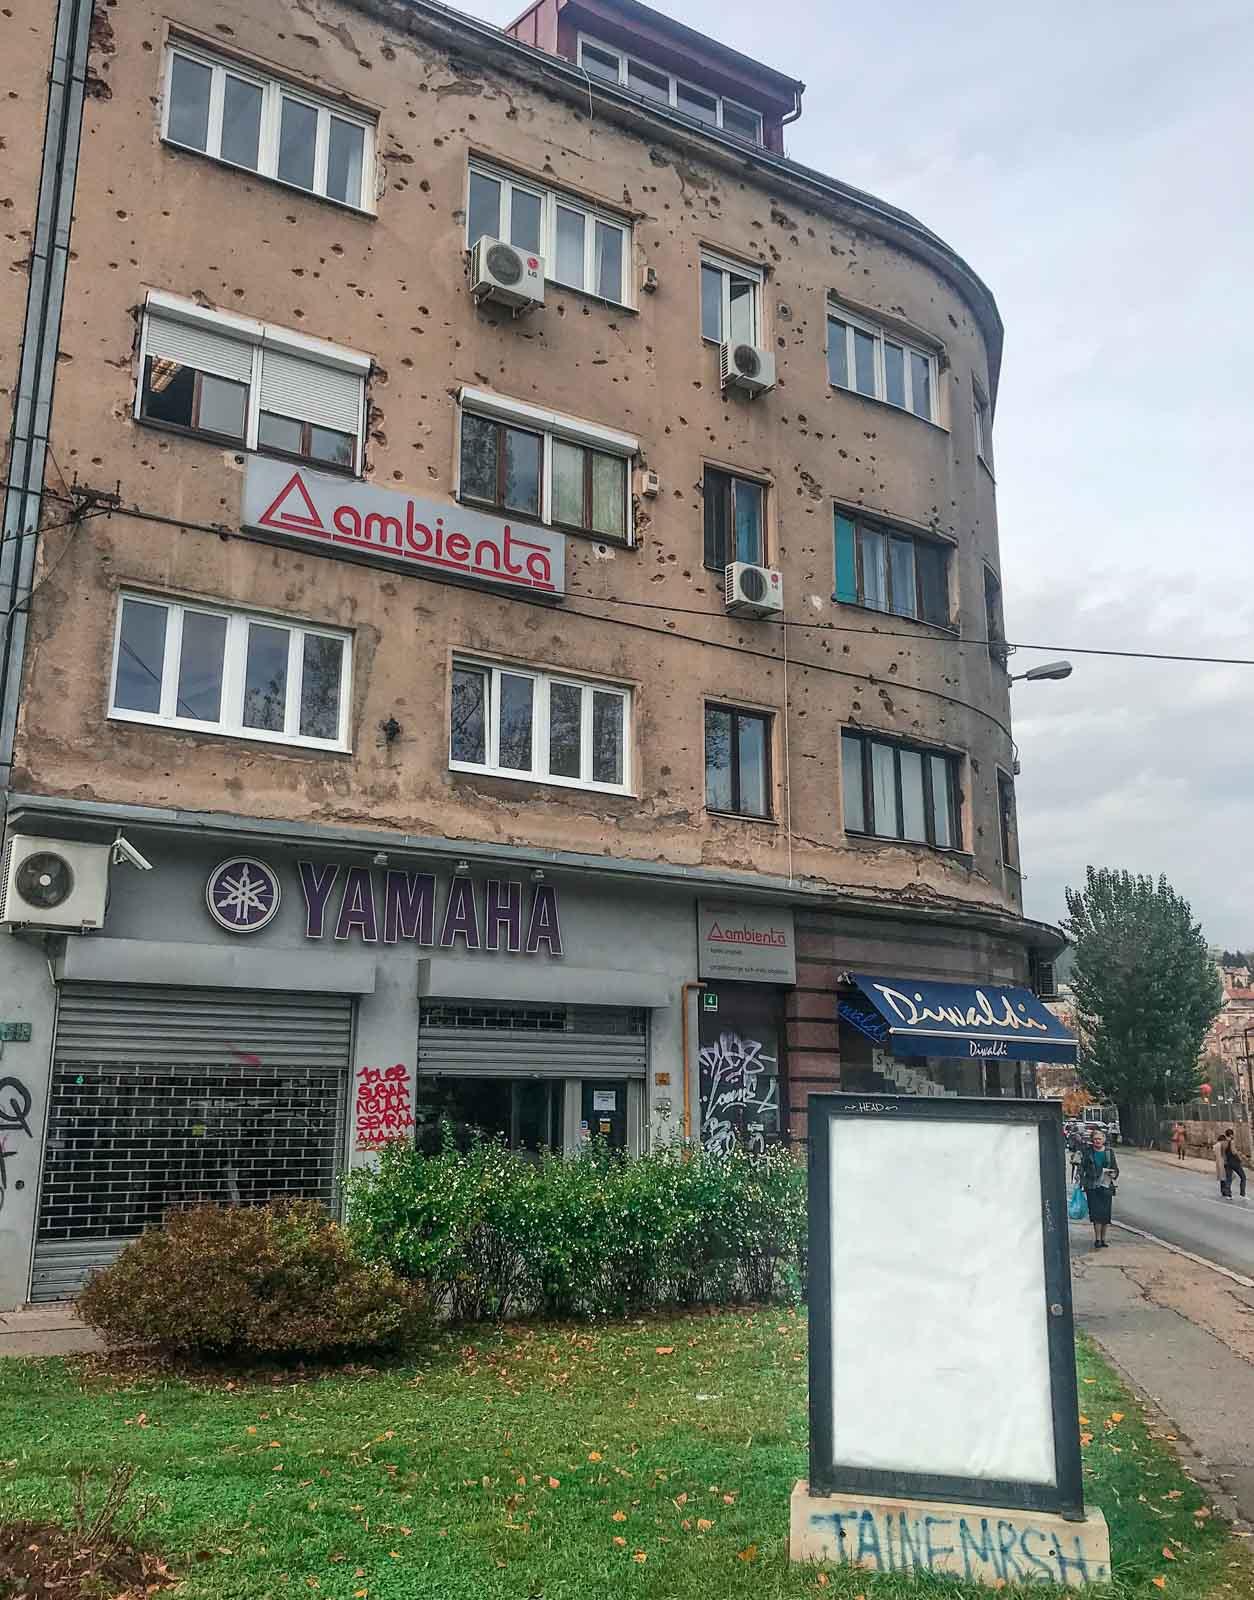 places to visit in sarajevo